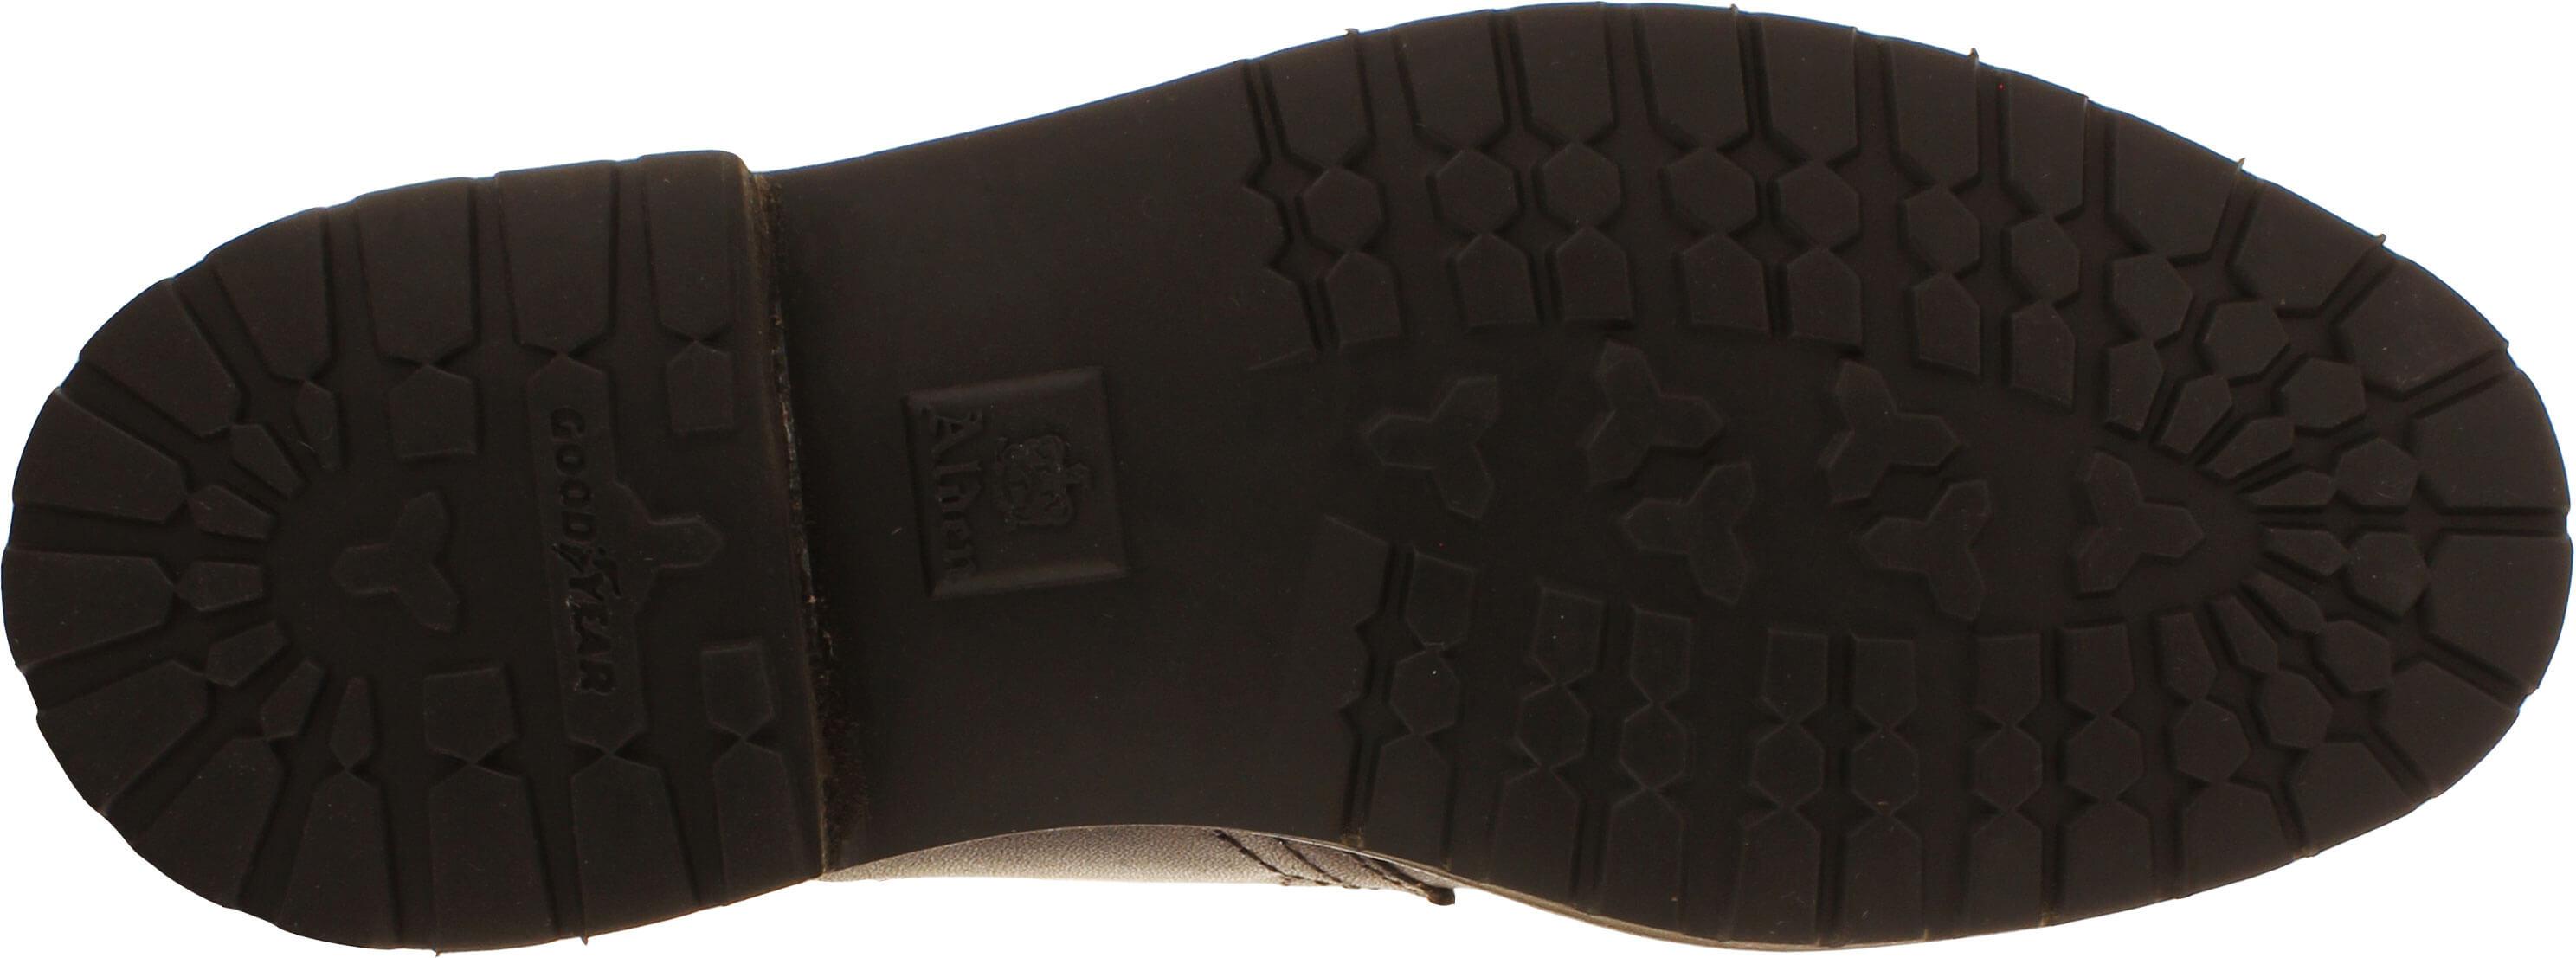 4015649c95cc Alden Men s 1272S - Chukka Boot - Dark Brown Kudu - The Shoe Mart